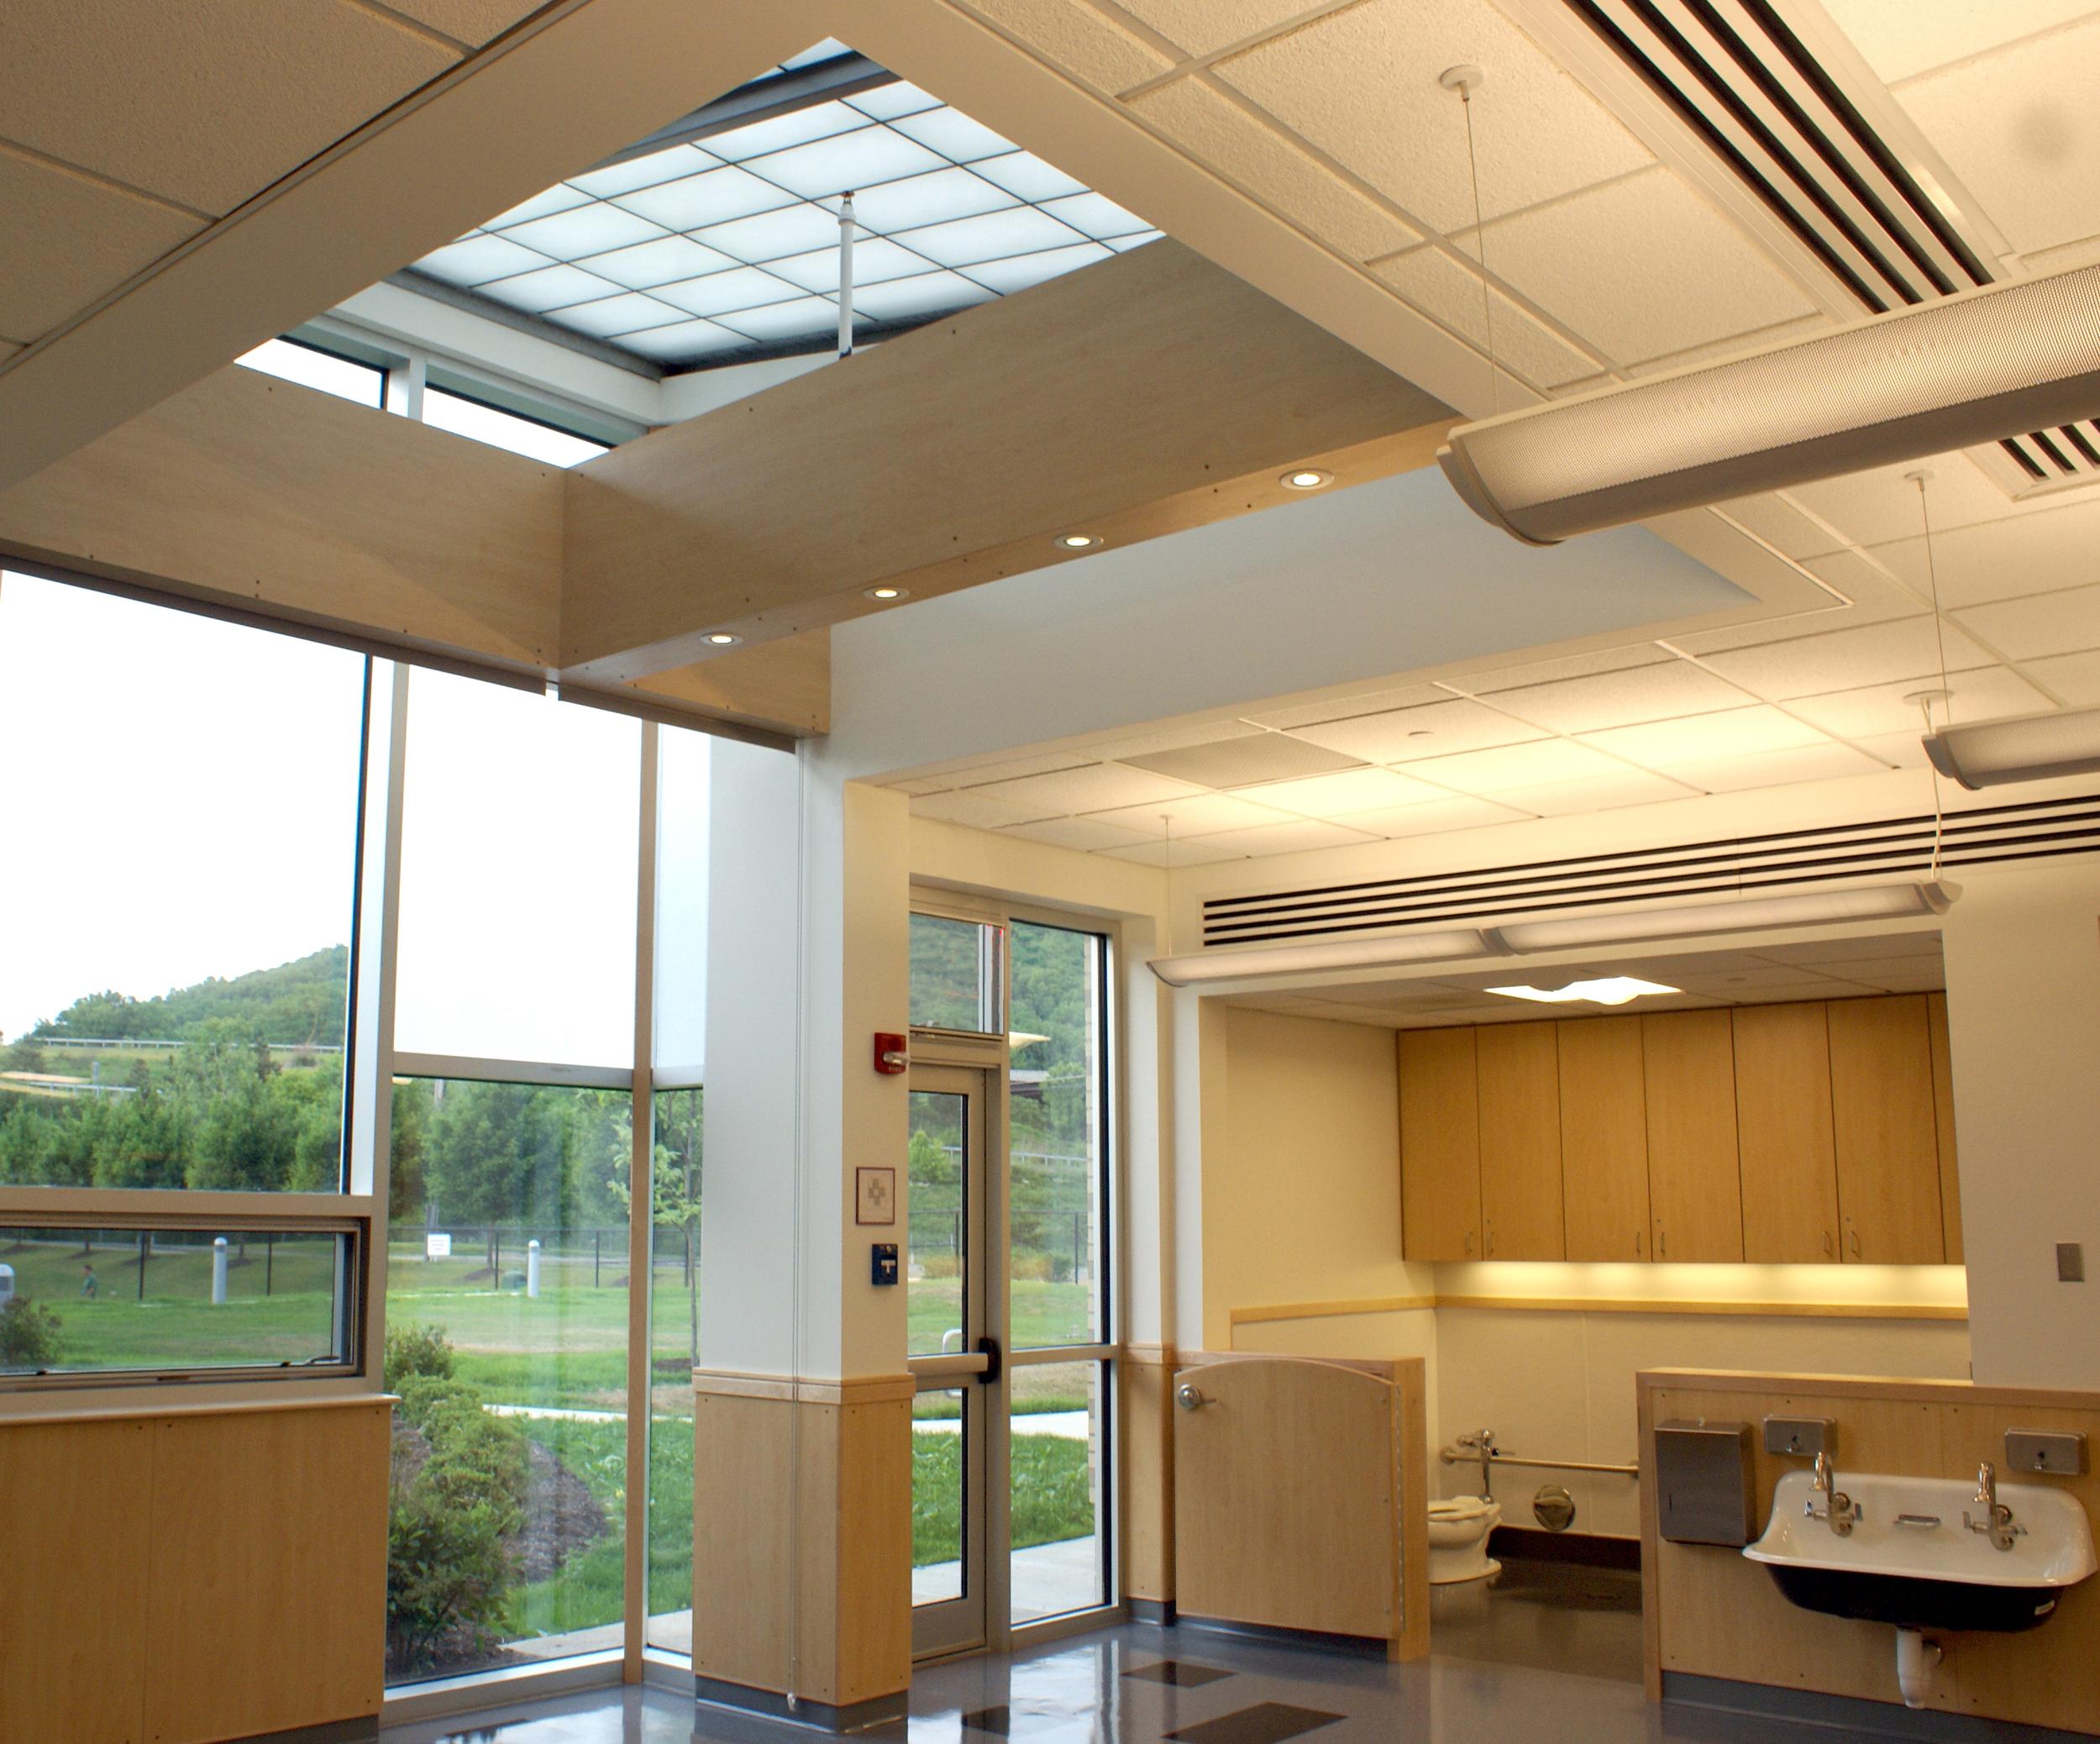 phopro-int-classrm skylight open-431ppi-7x6.jpg